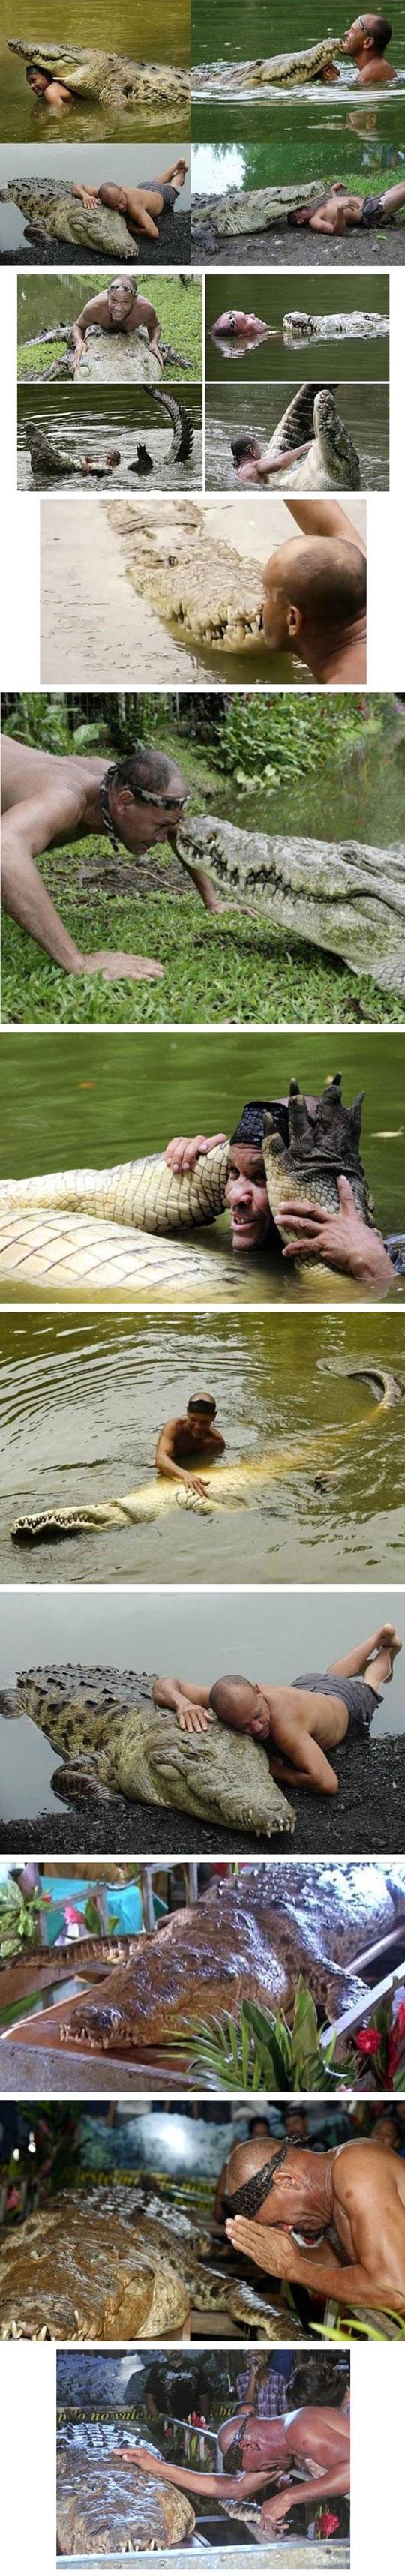 Poncho, The Friendly Crocodile